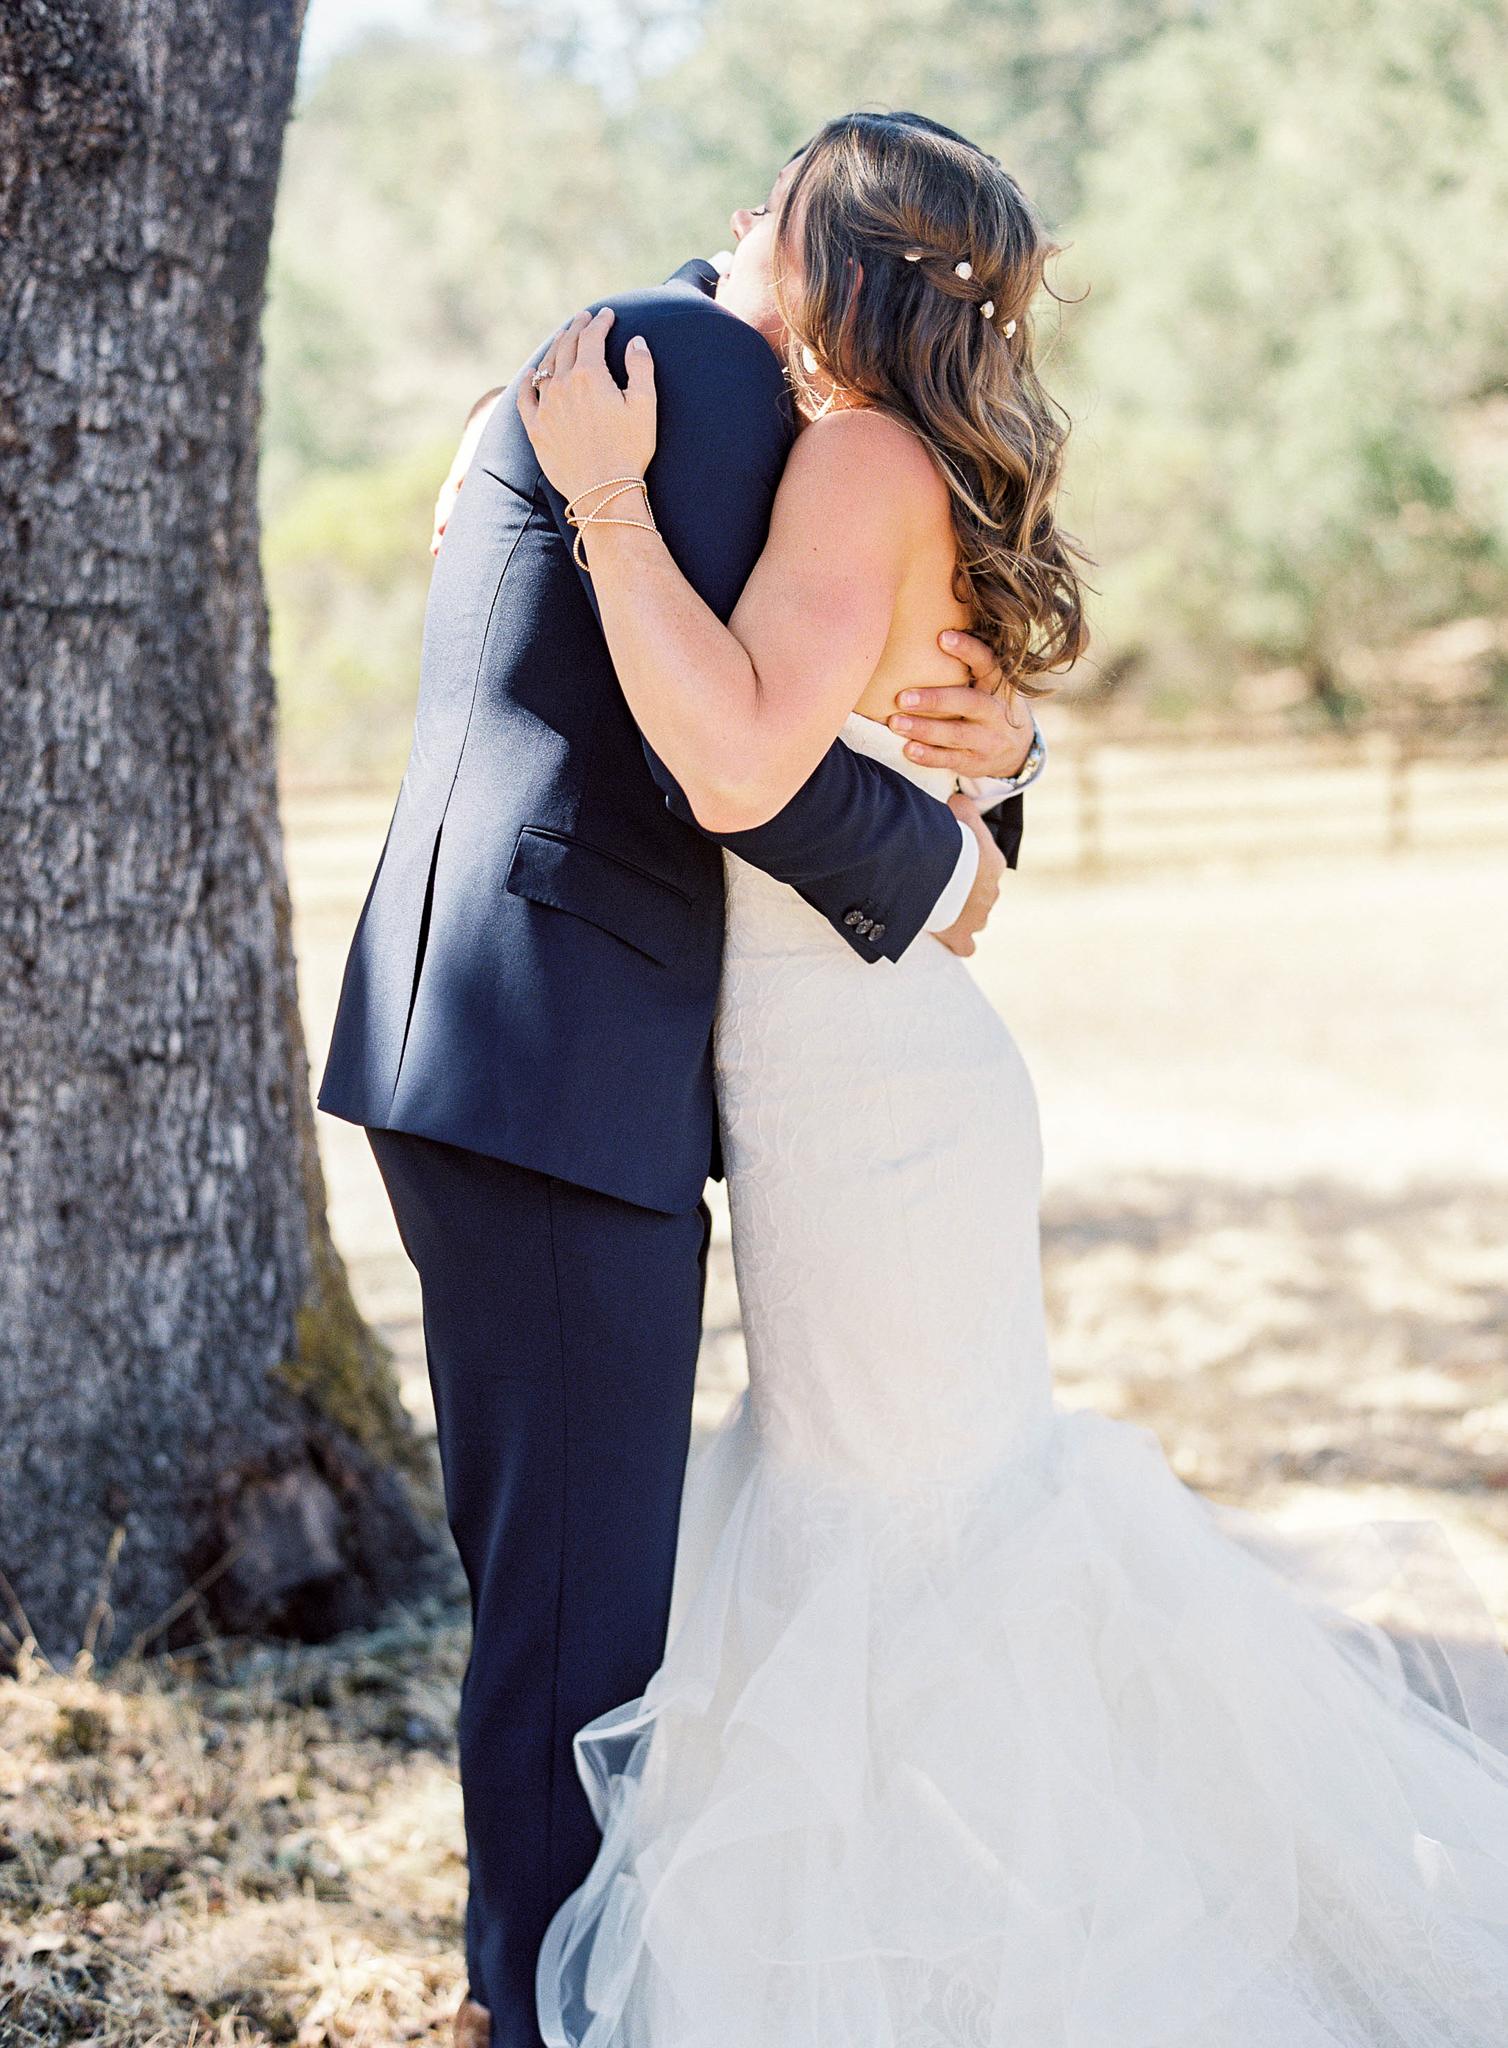 Meghan Mehan Photography - Fine Art Film Wedding Photography - San Francisco   Napa   Sonoma   Big Sur   Chicago   Minneapolis   Milwaukee   Lake Geneva   Door County   Wisconsin 010.jpg